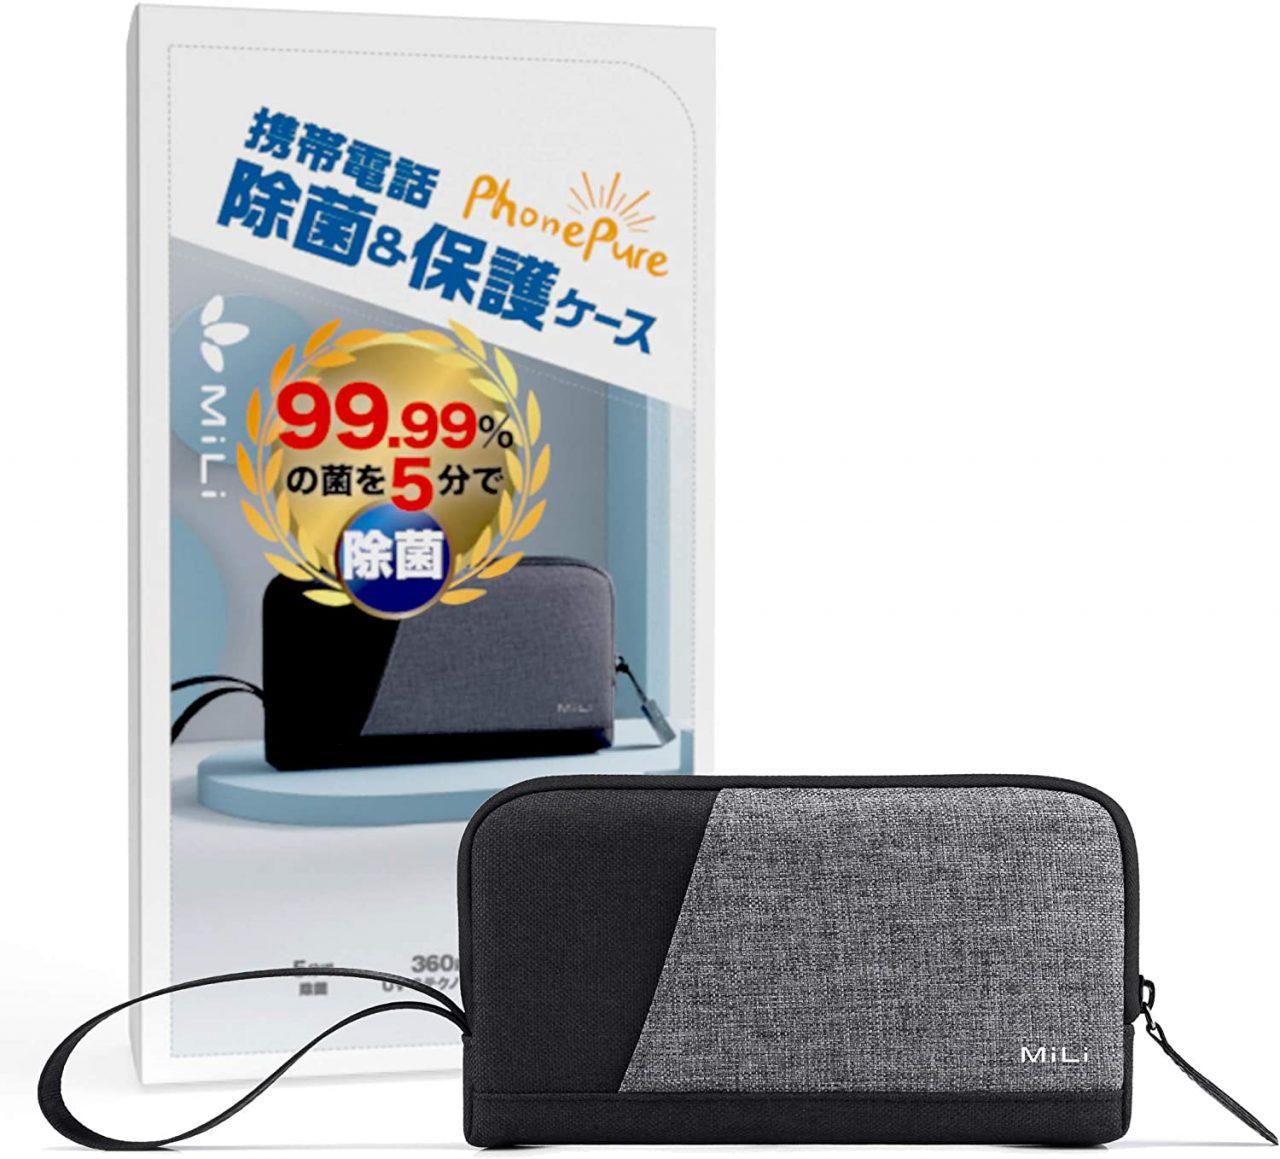 Phone Pure商品画像